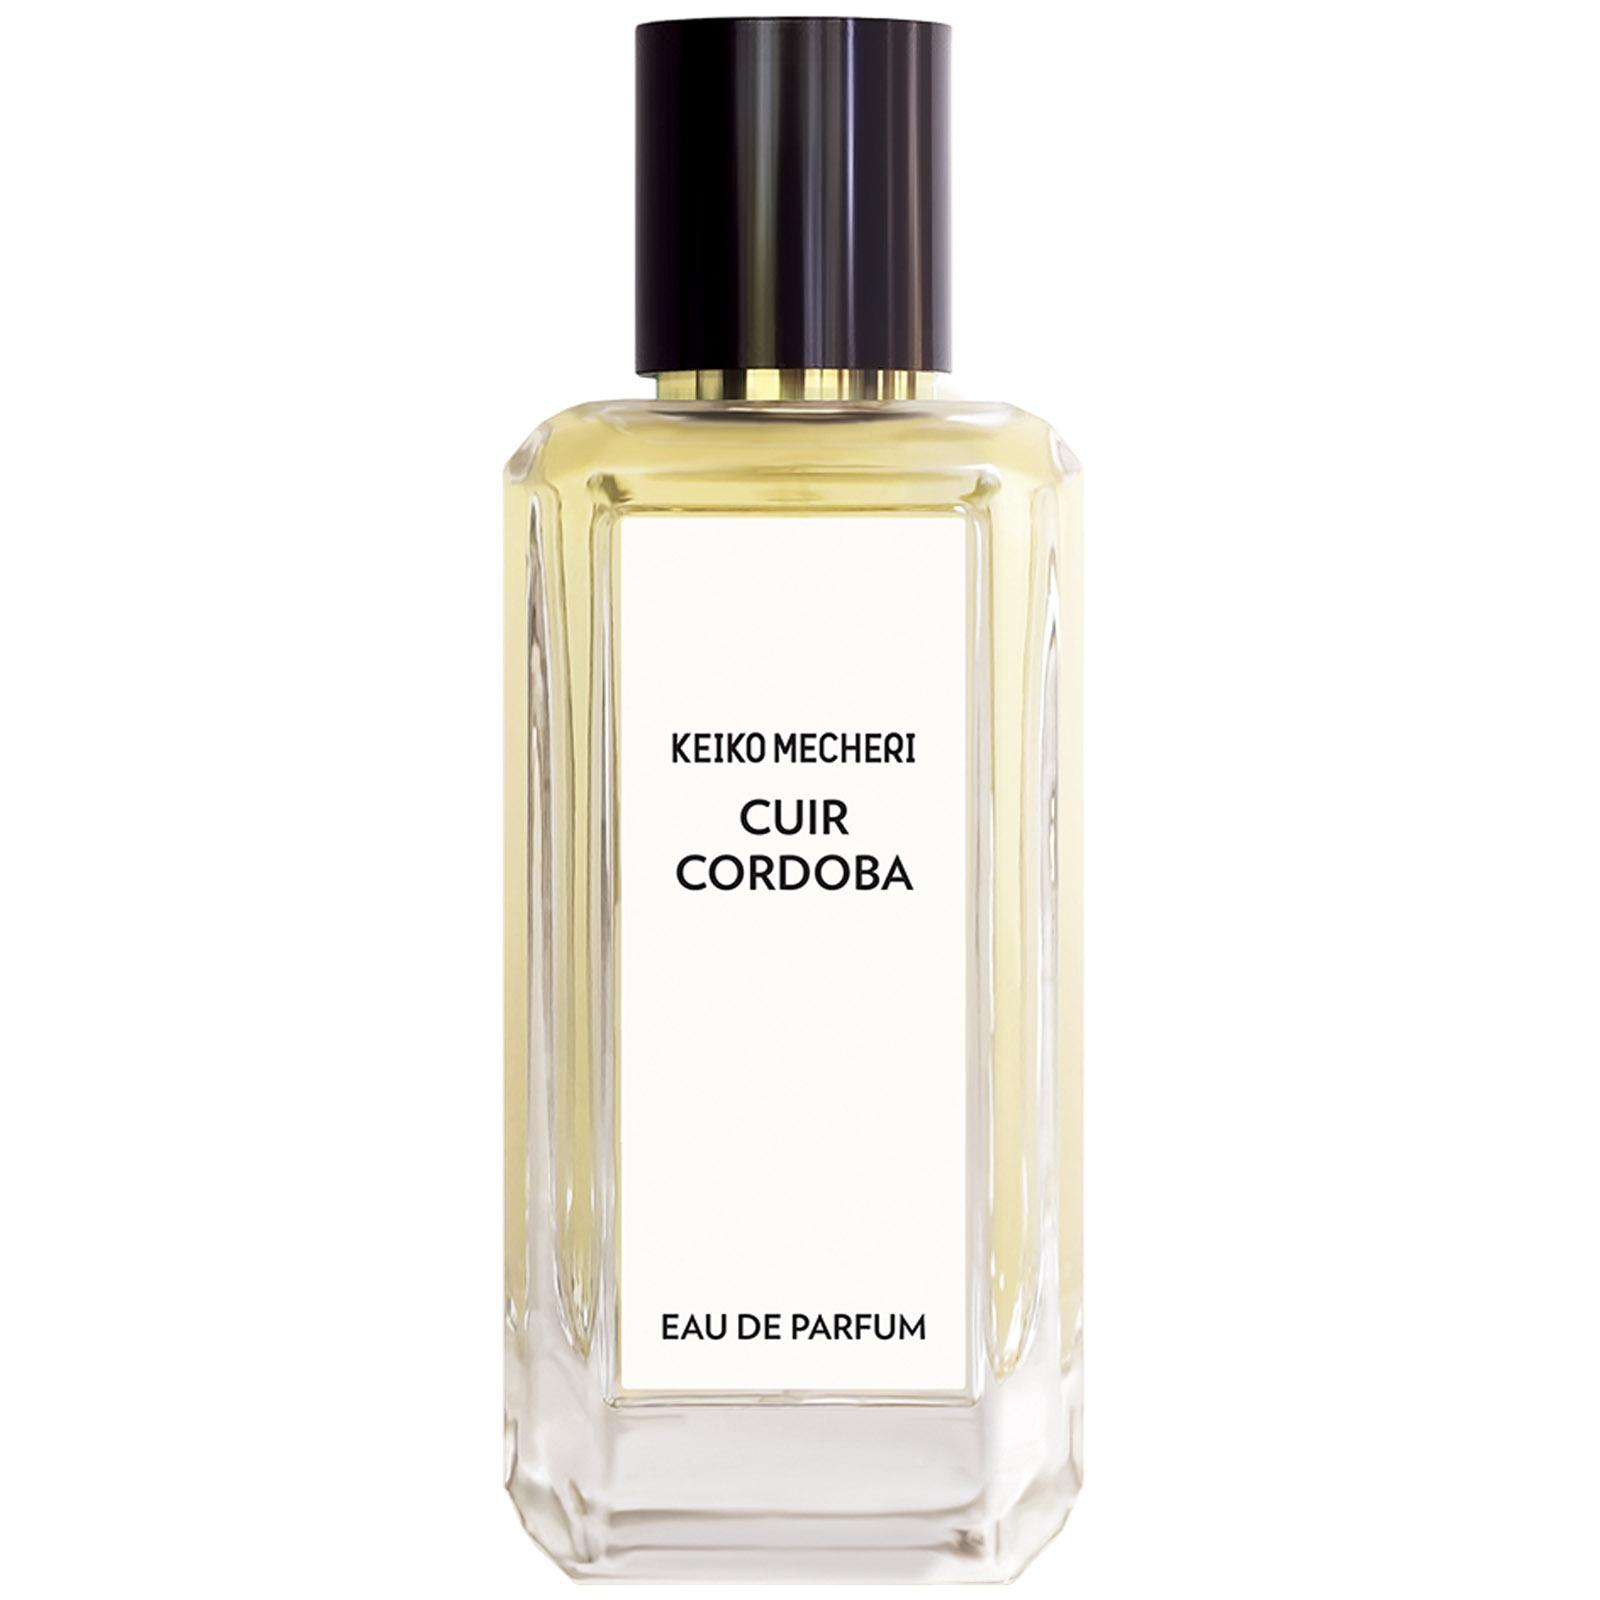 Cuir cordoba profumo eau de parfum 75 ml